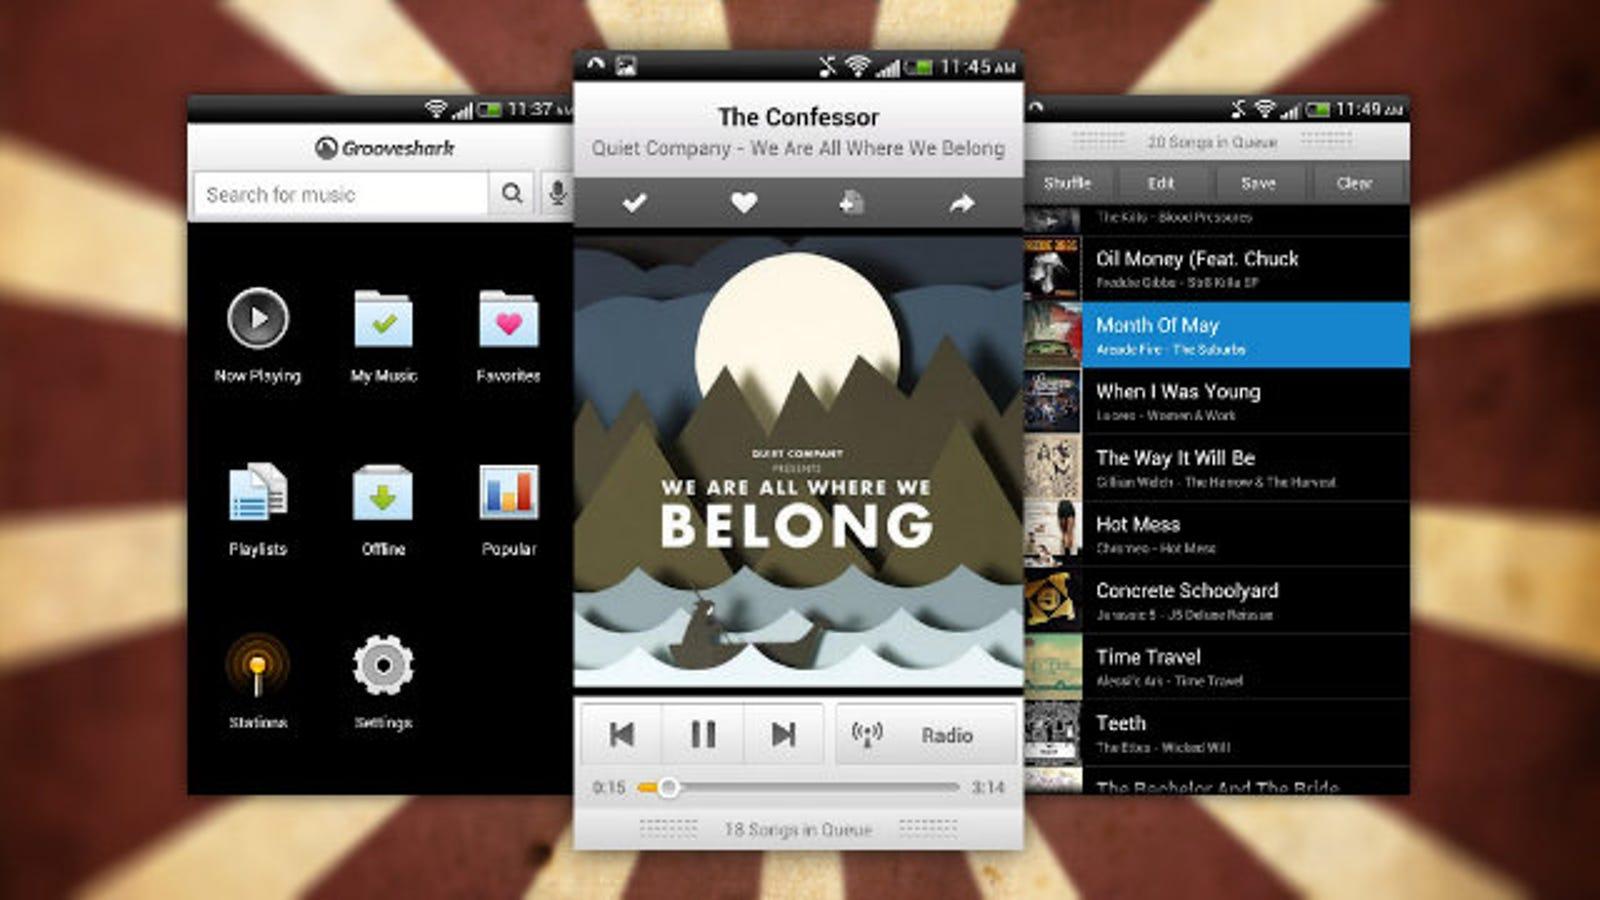 Grooveshark app android free